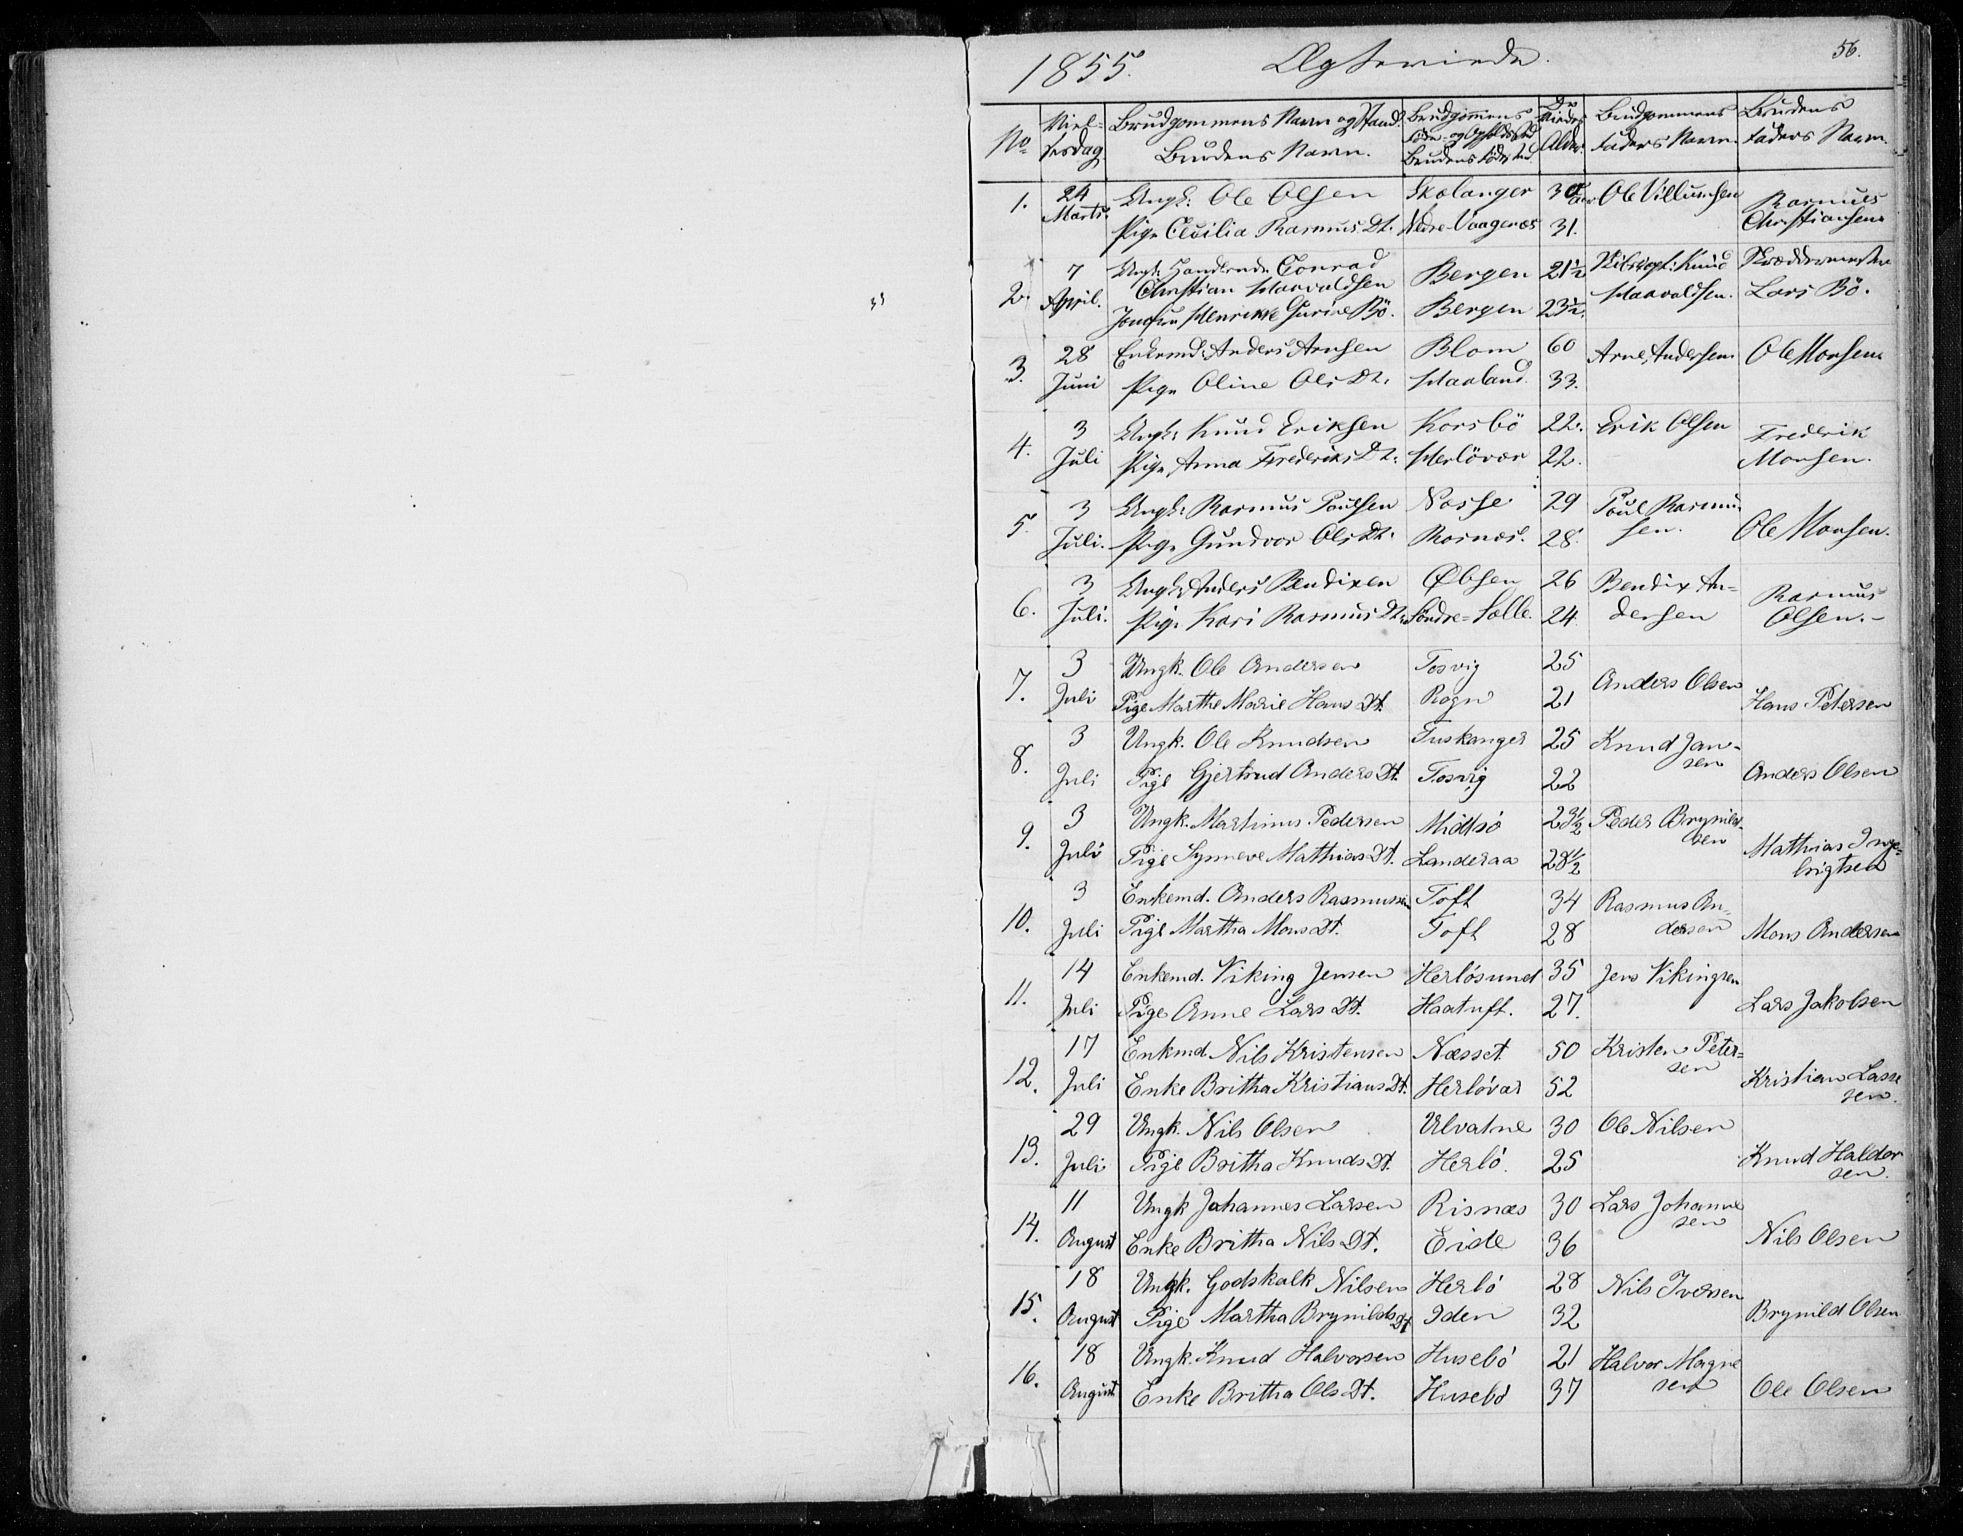 SAB, Herdla Sokneprestembete, H/Haa: Ministerialbok nr. A 1, 1855-1869, s. 56